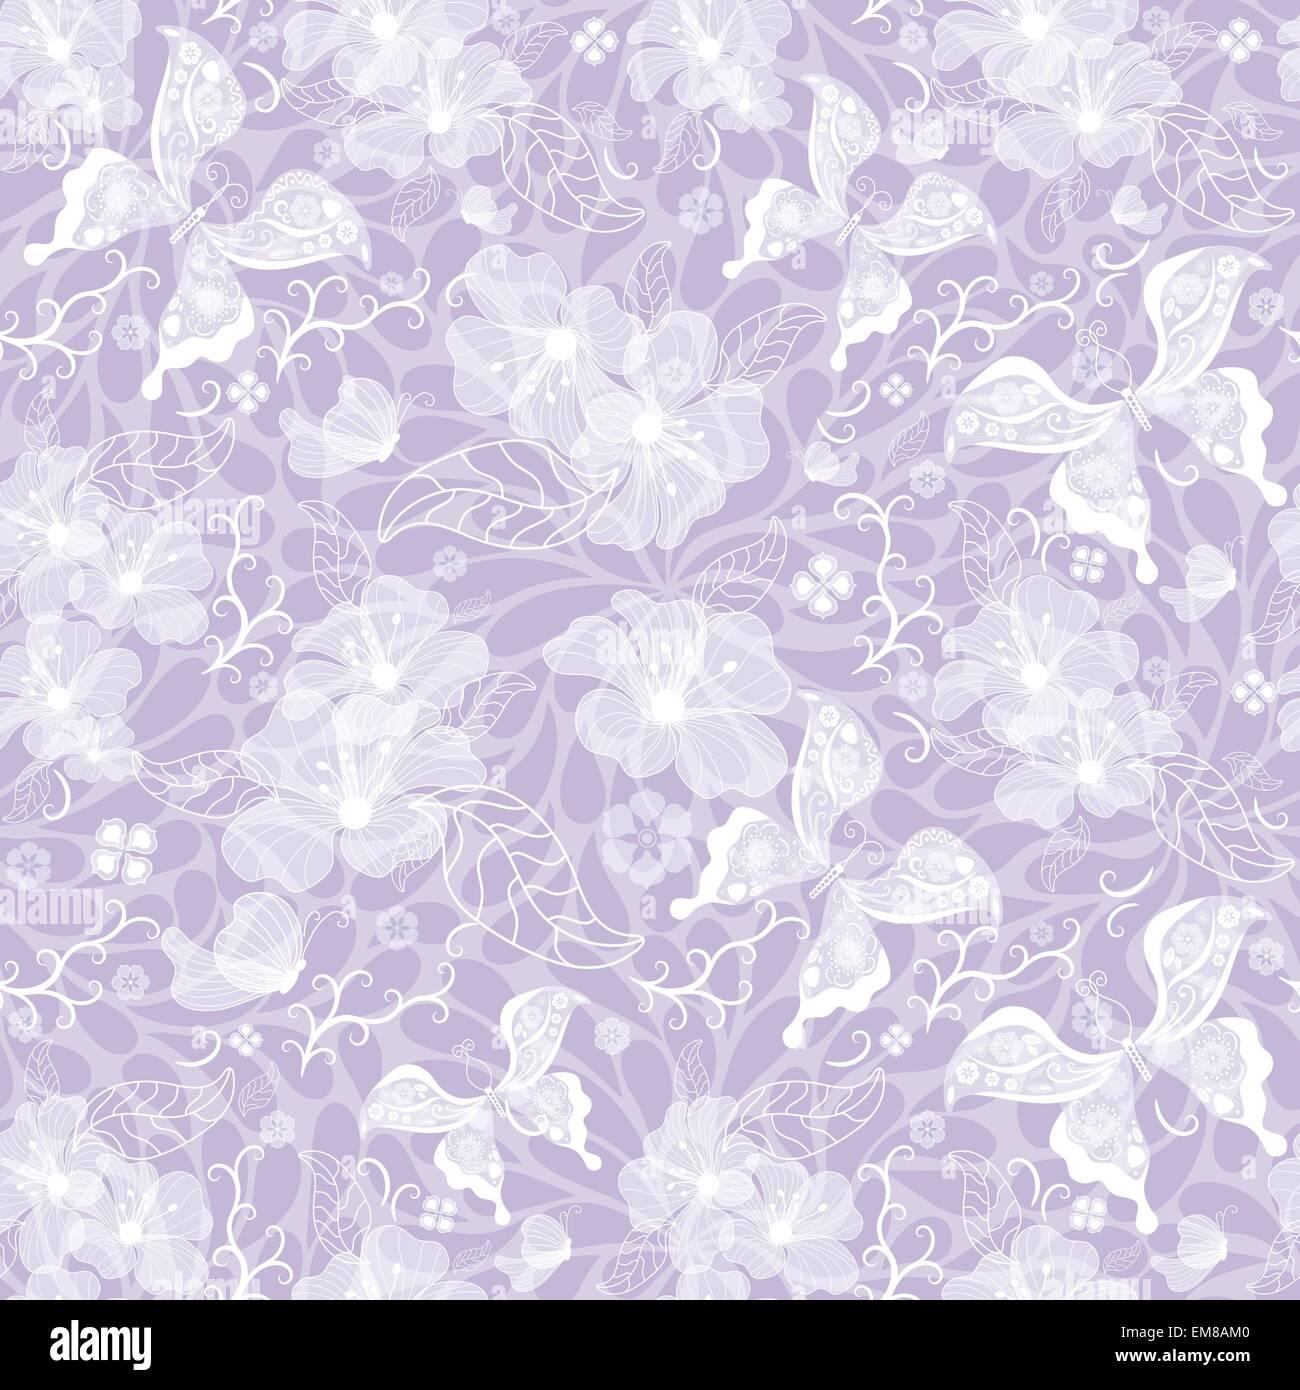 Gentle seamless violet vintage pattern - Stock Image